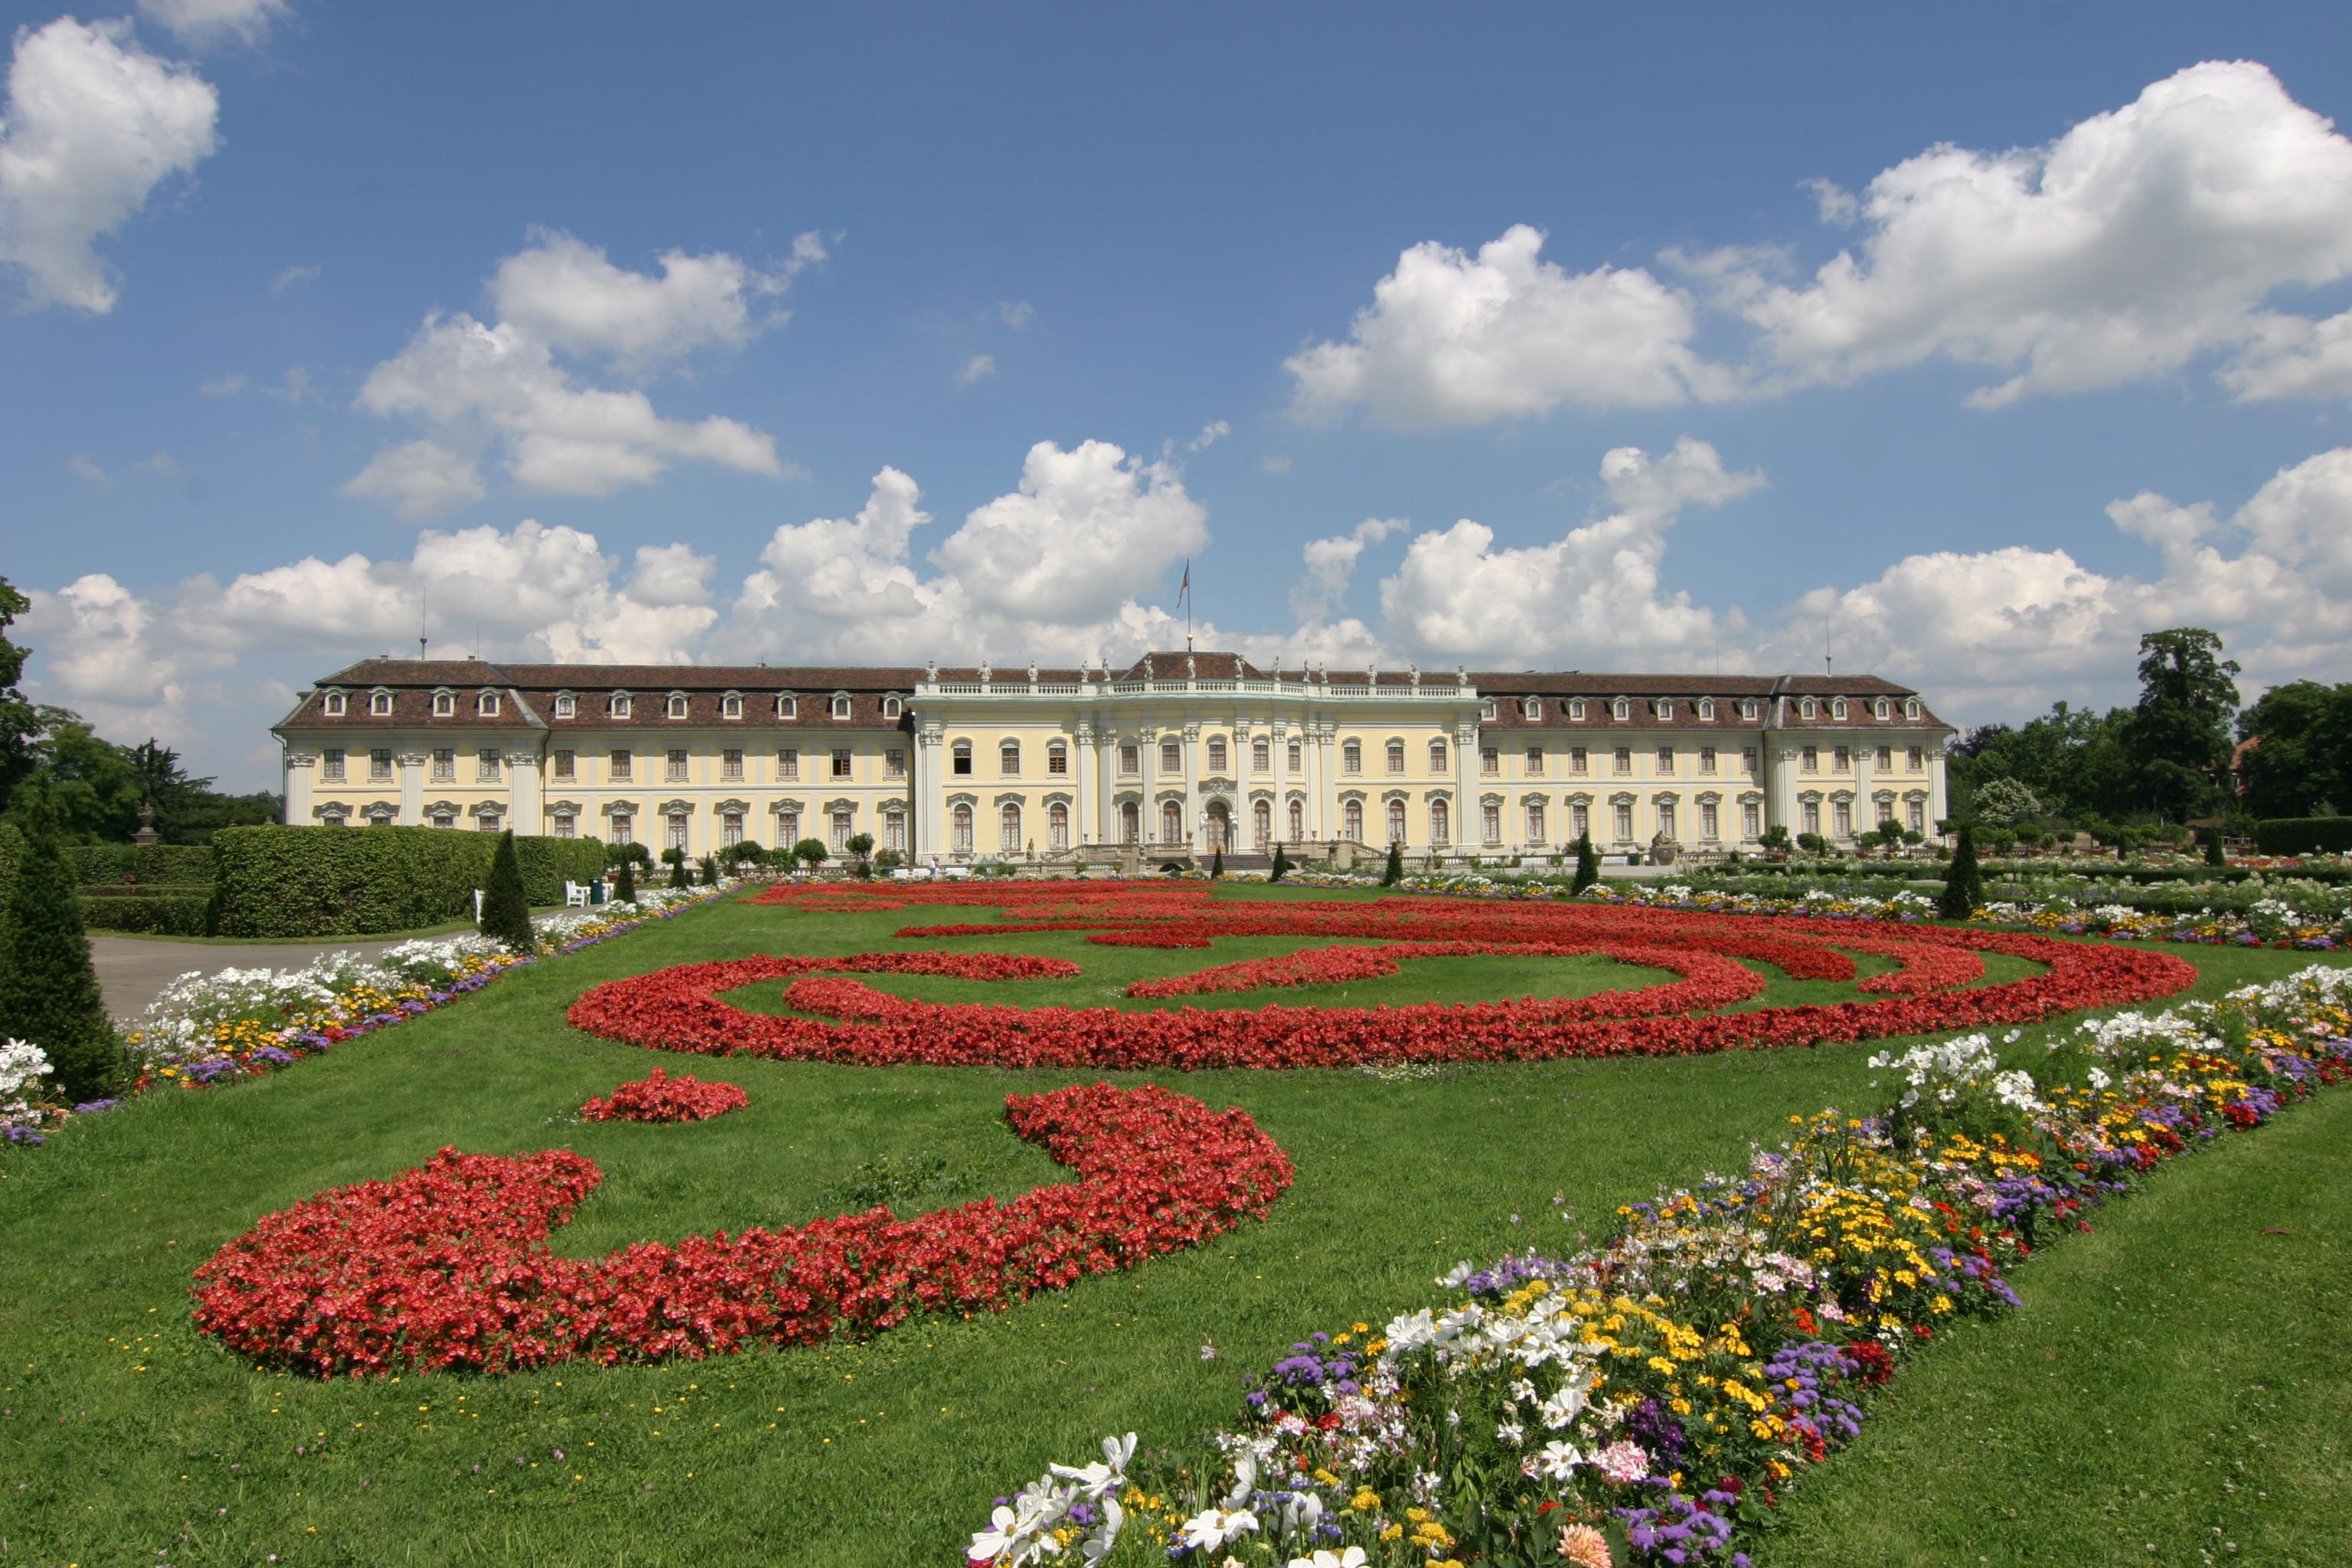 Stadt Ludwigsburg